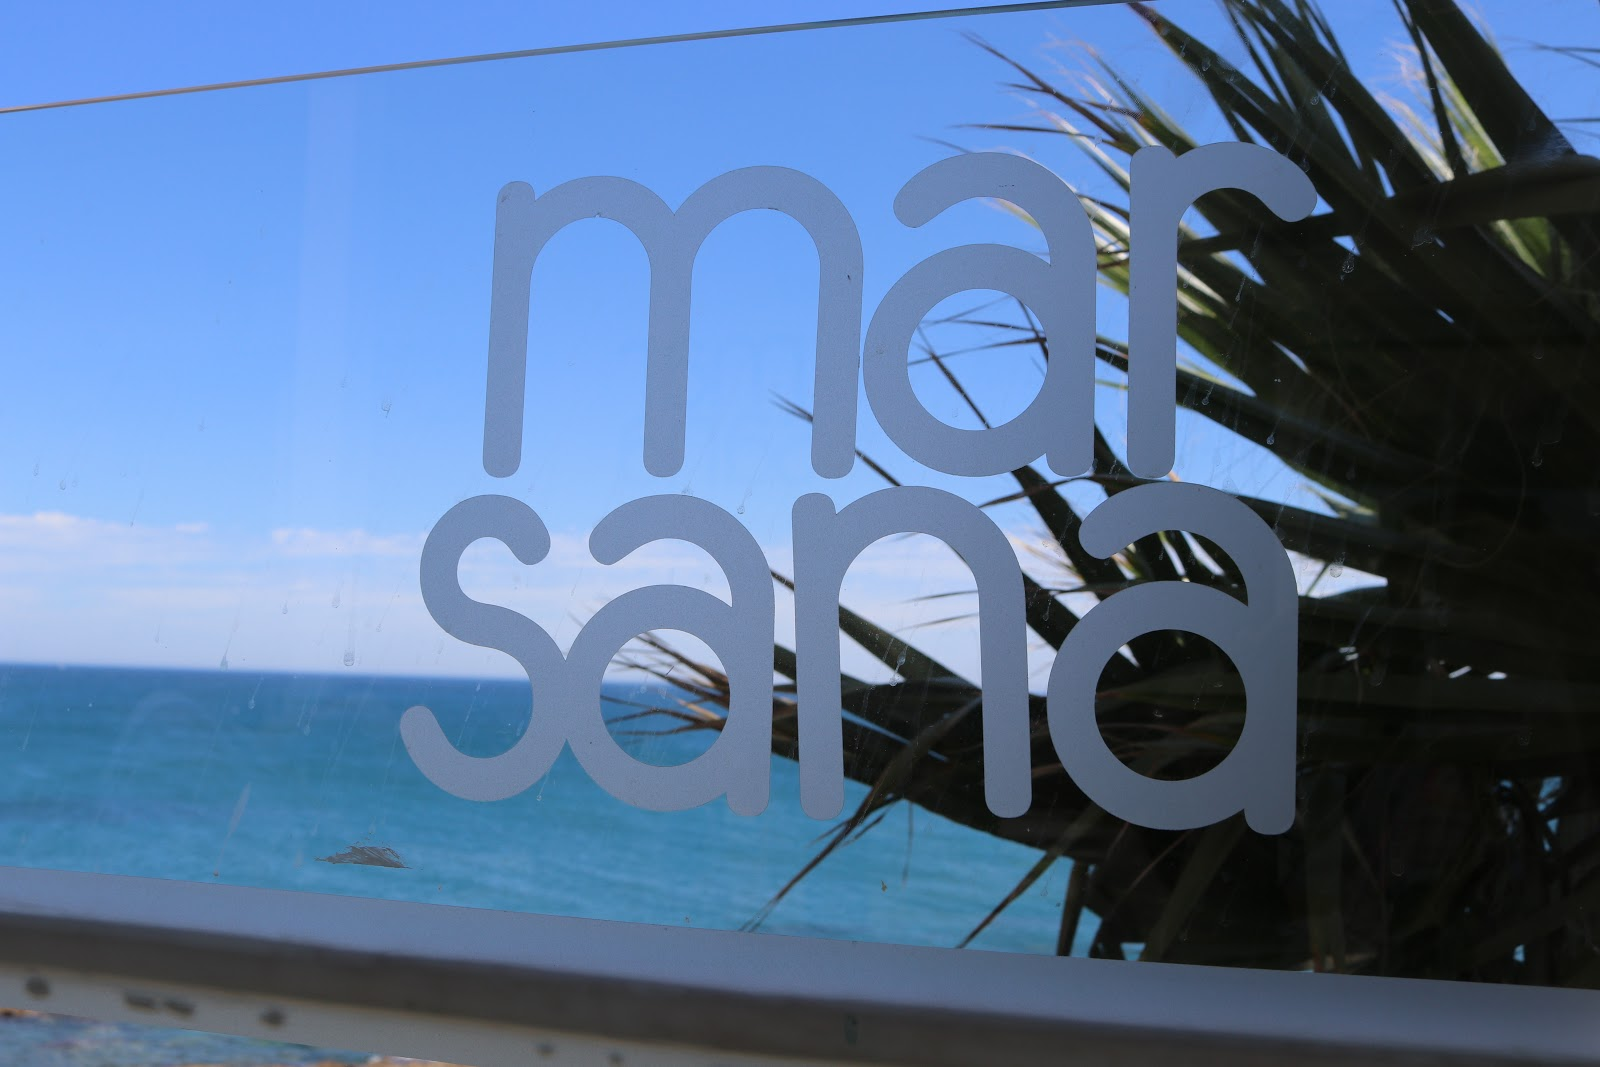 Mar Sana, Sotogrande, Spain